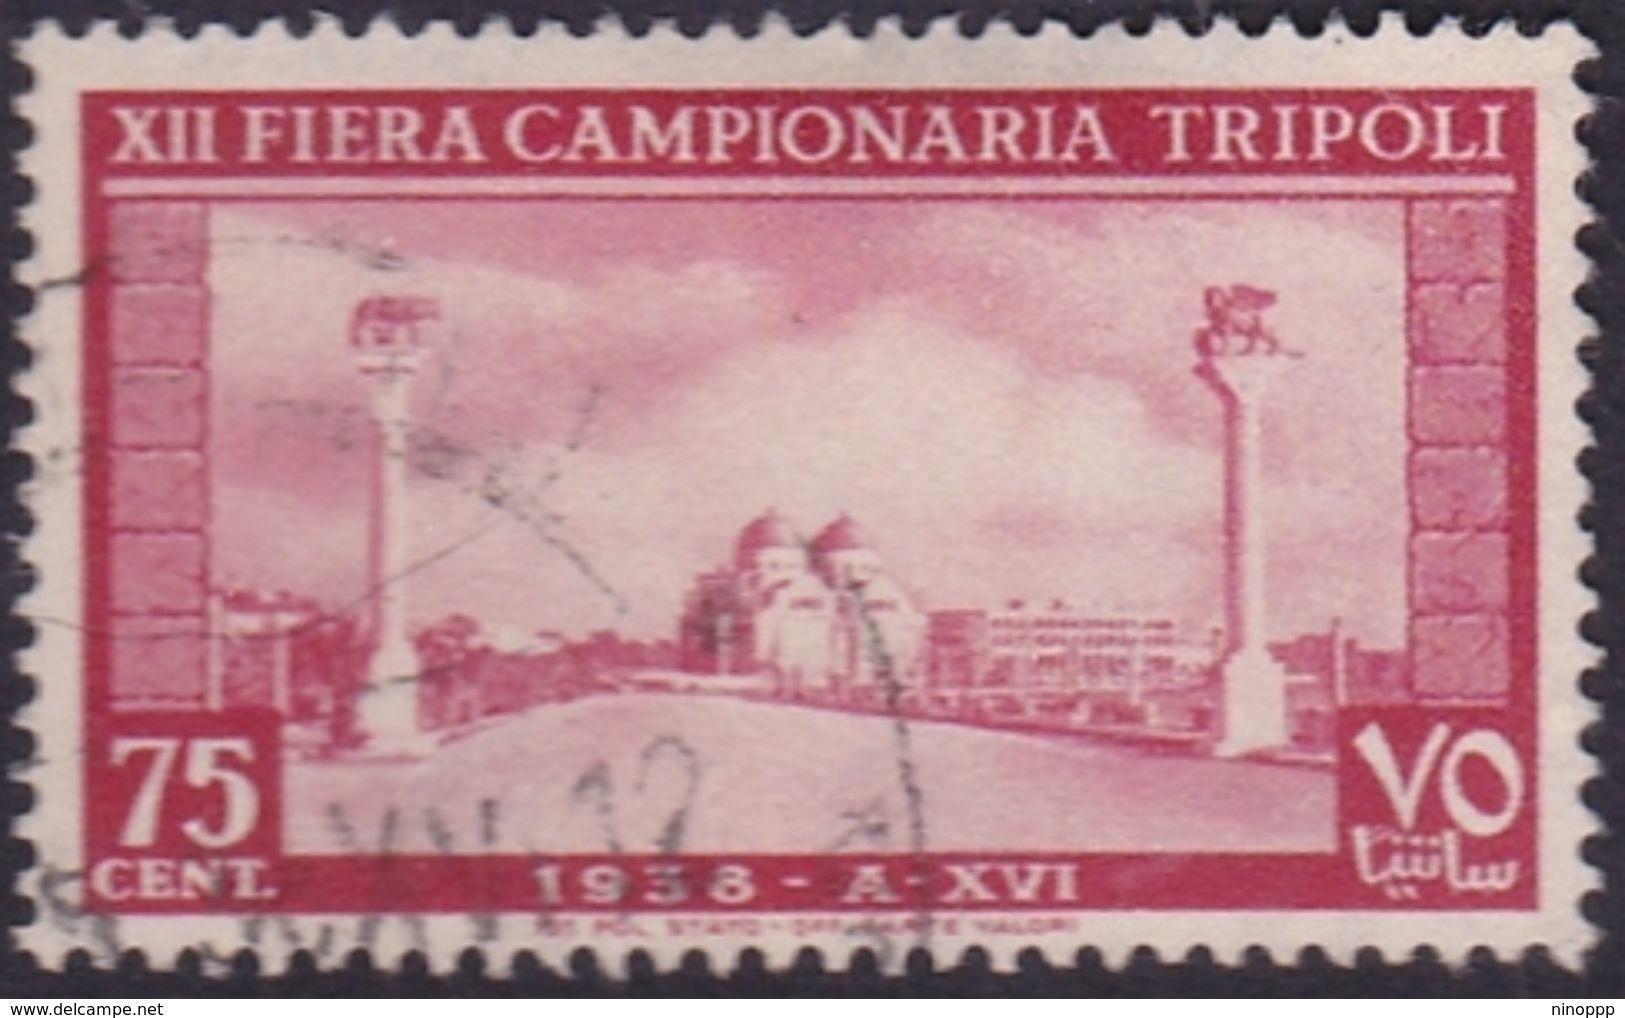 Italy-Colonies And Territories-Libya S 150 1938 12th Tripoli Fair,75c Carmine,used - Libya